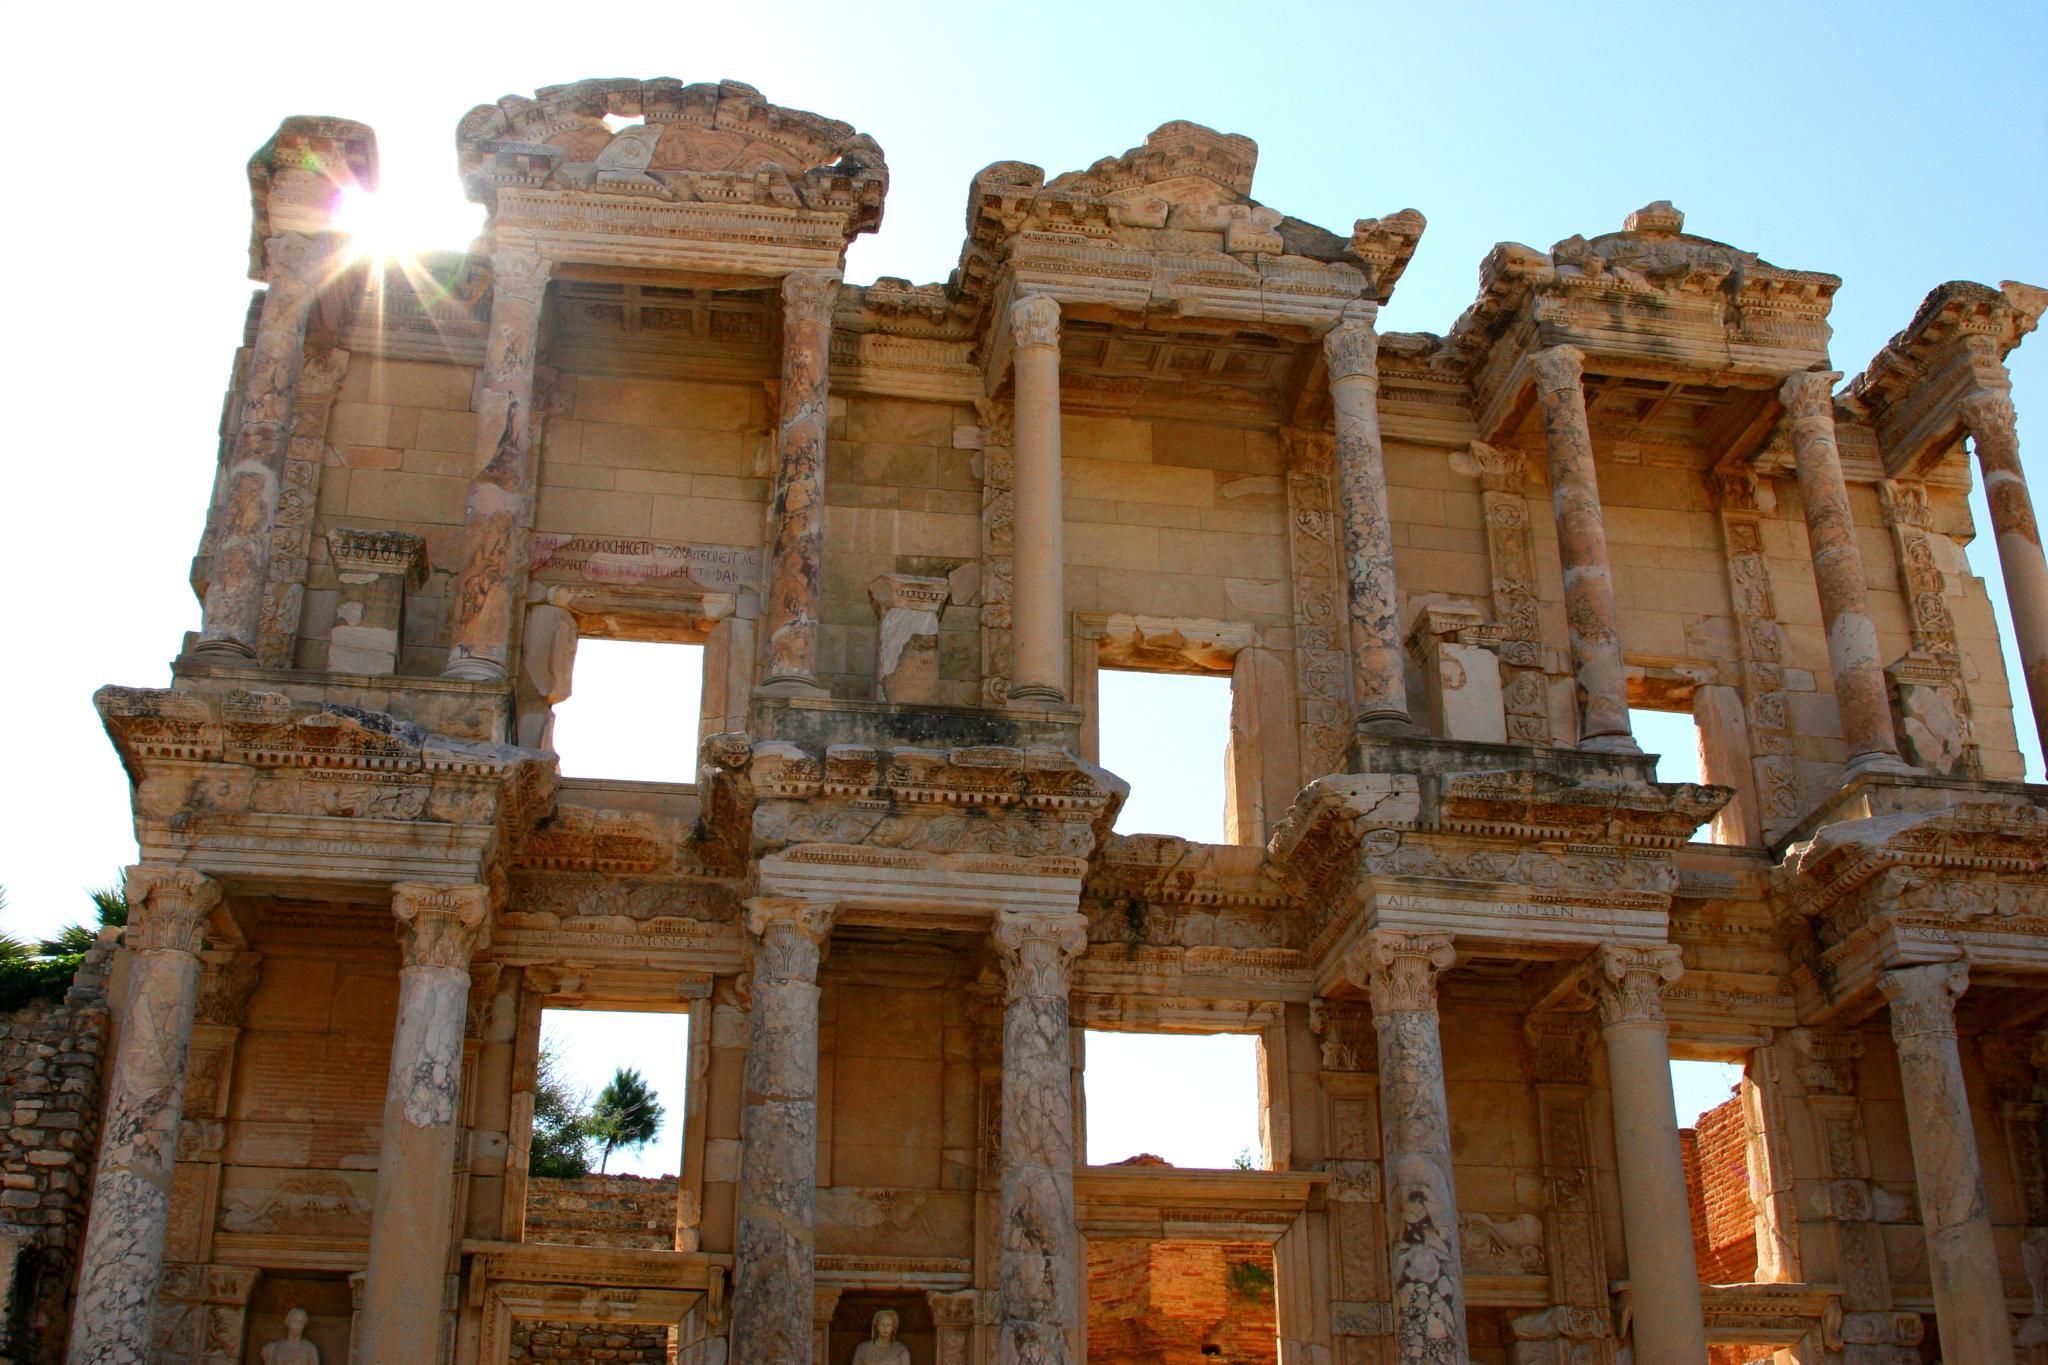 Celsus library,Ephesus, Turkey by mihai muraretu